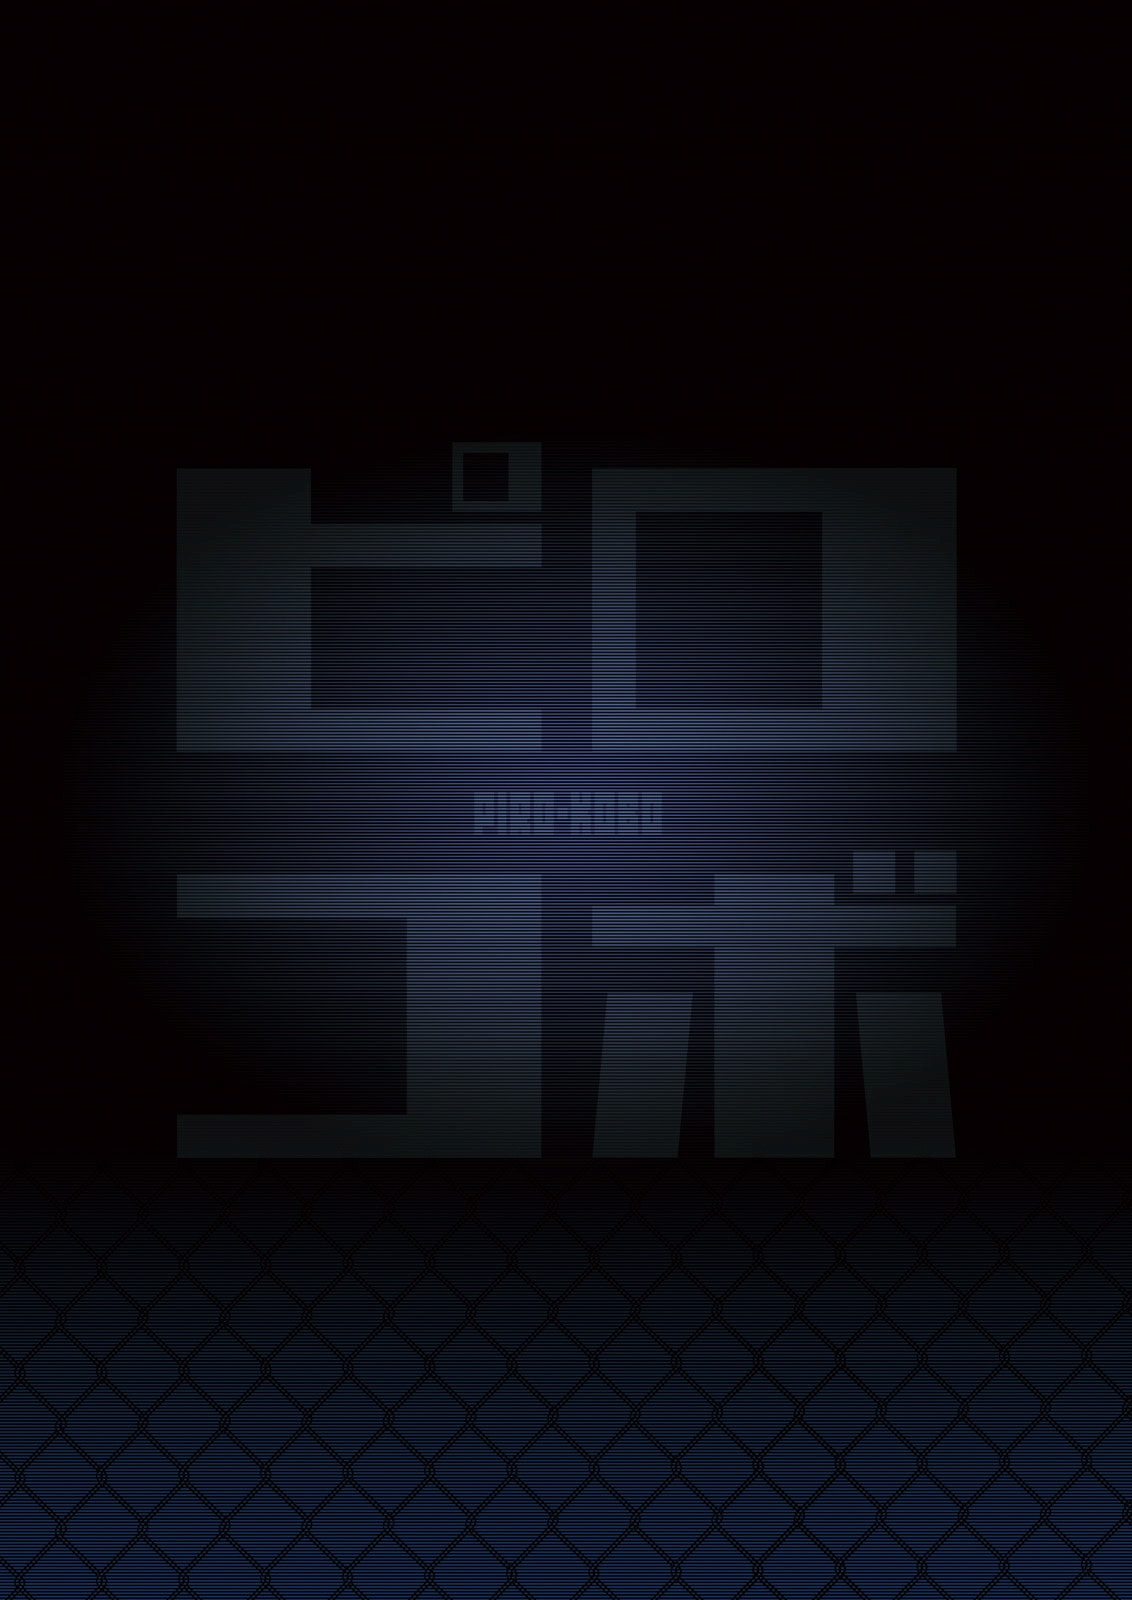 HentaiVN.net - Ảnh 28 - Damegami-sama wa Nomisugi ni Gochuui o! (Kono Subarashii Sekai ni Syukufuku o!) - 駄女神様は飲み過ぎにご注意を! (この素晴らしい世界に祝福を!) - Oneshot